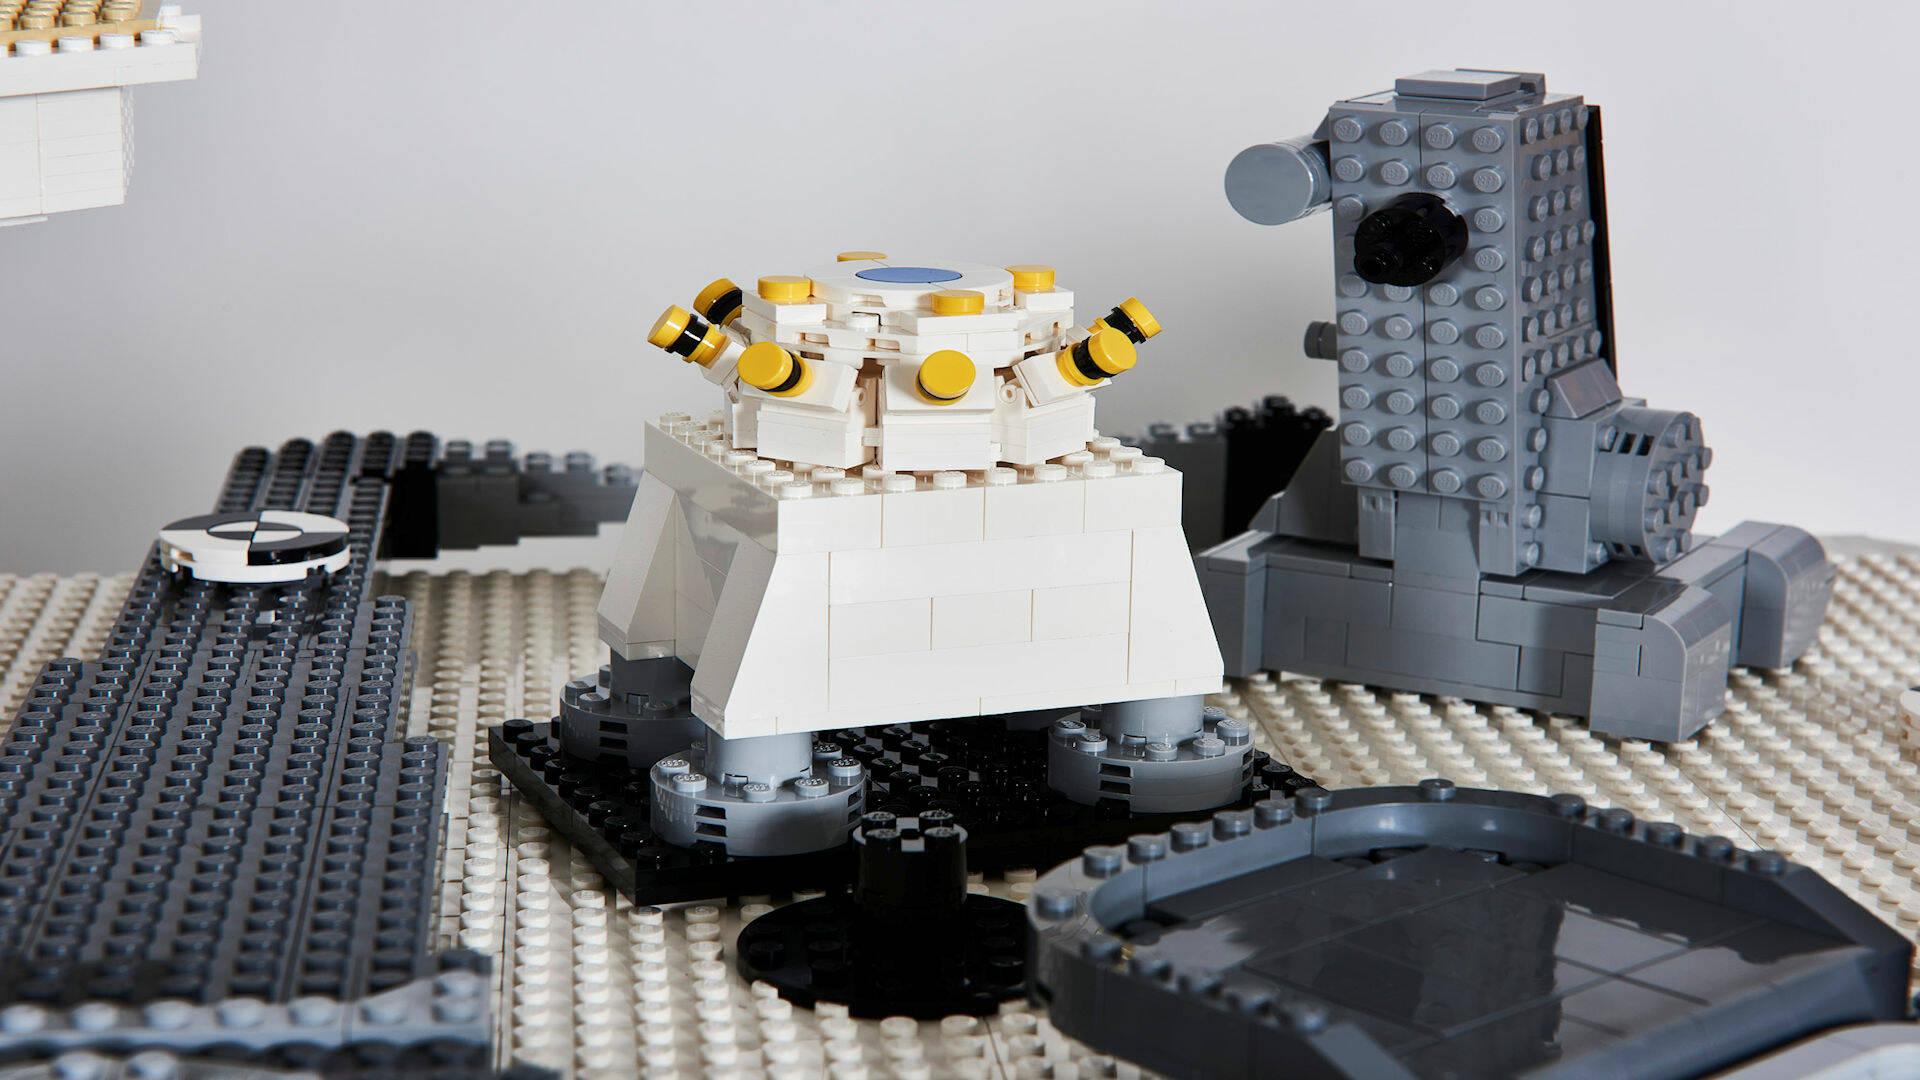 LEGO PERSEVERANCE BY RICCARDO ZANGELMI